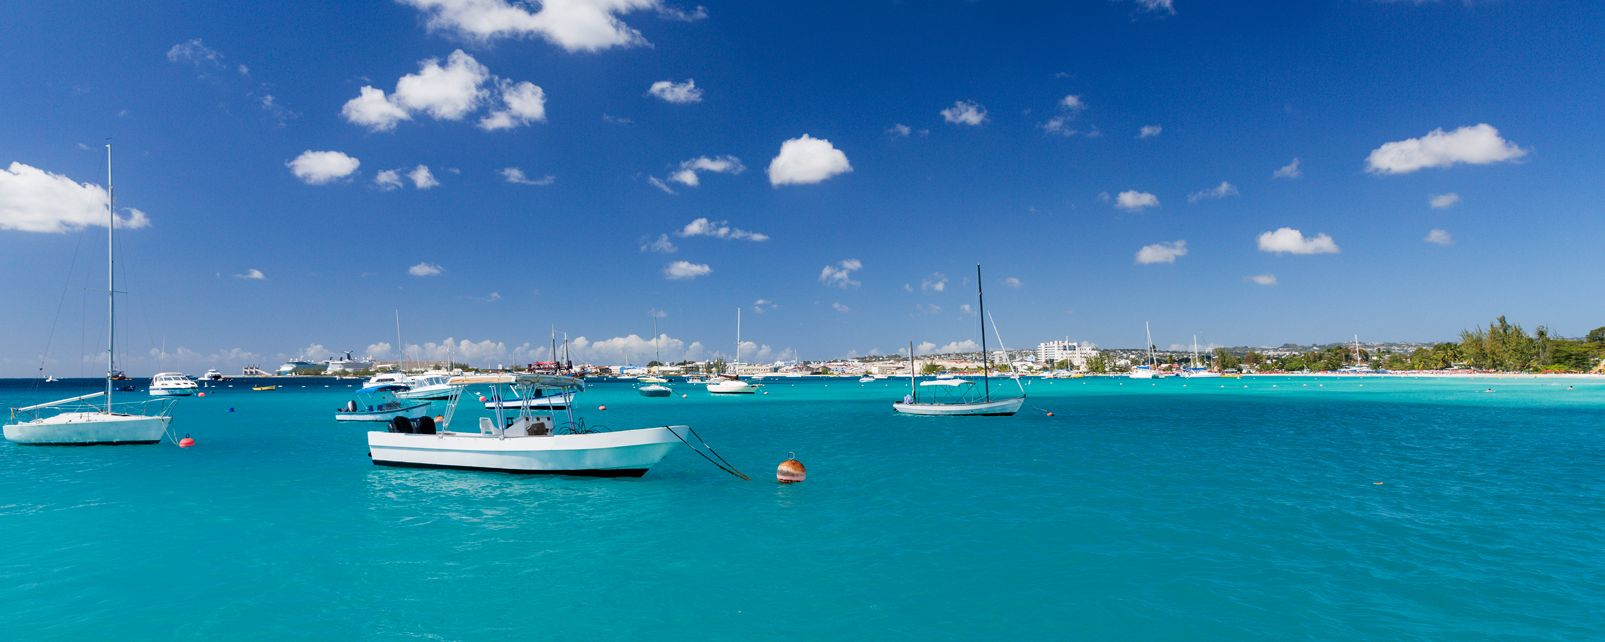 Les côtes, Barbados, barbade, antilles, amérique, caraïbes, mer